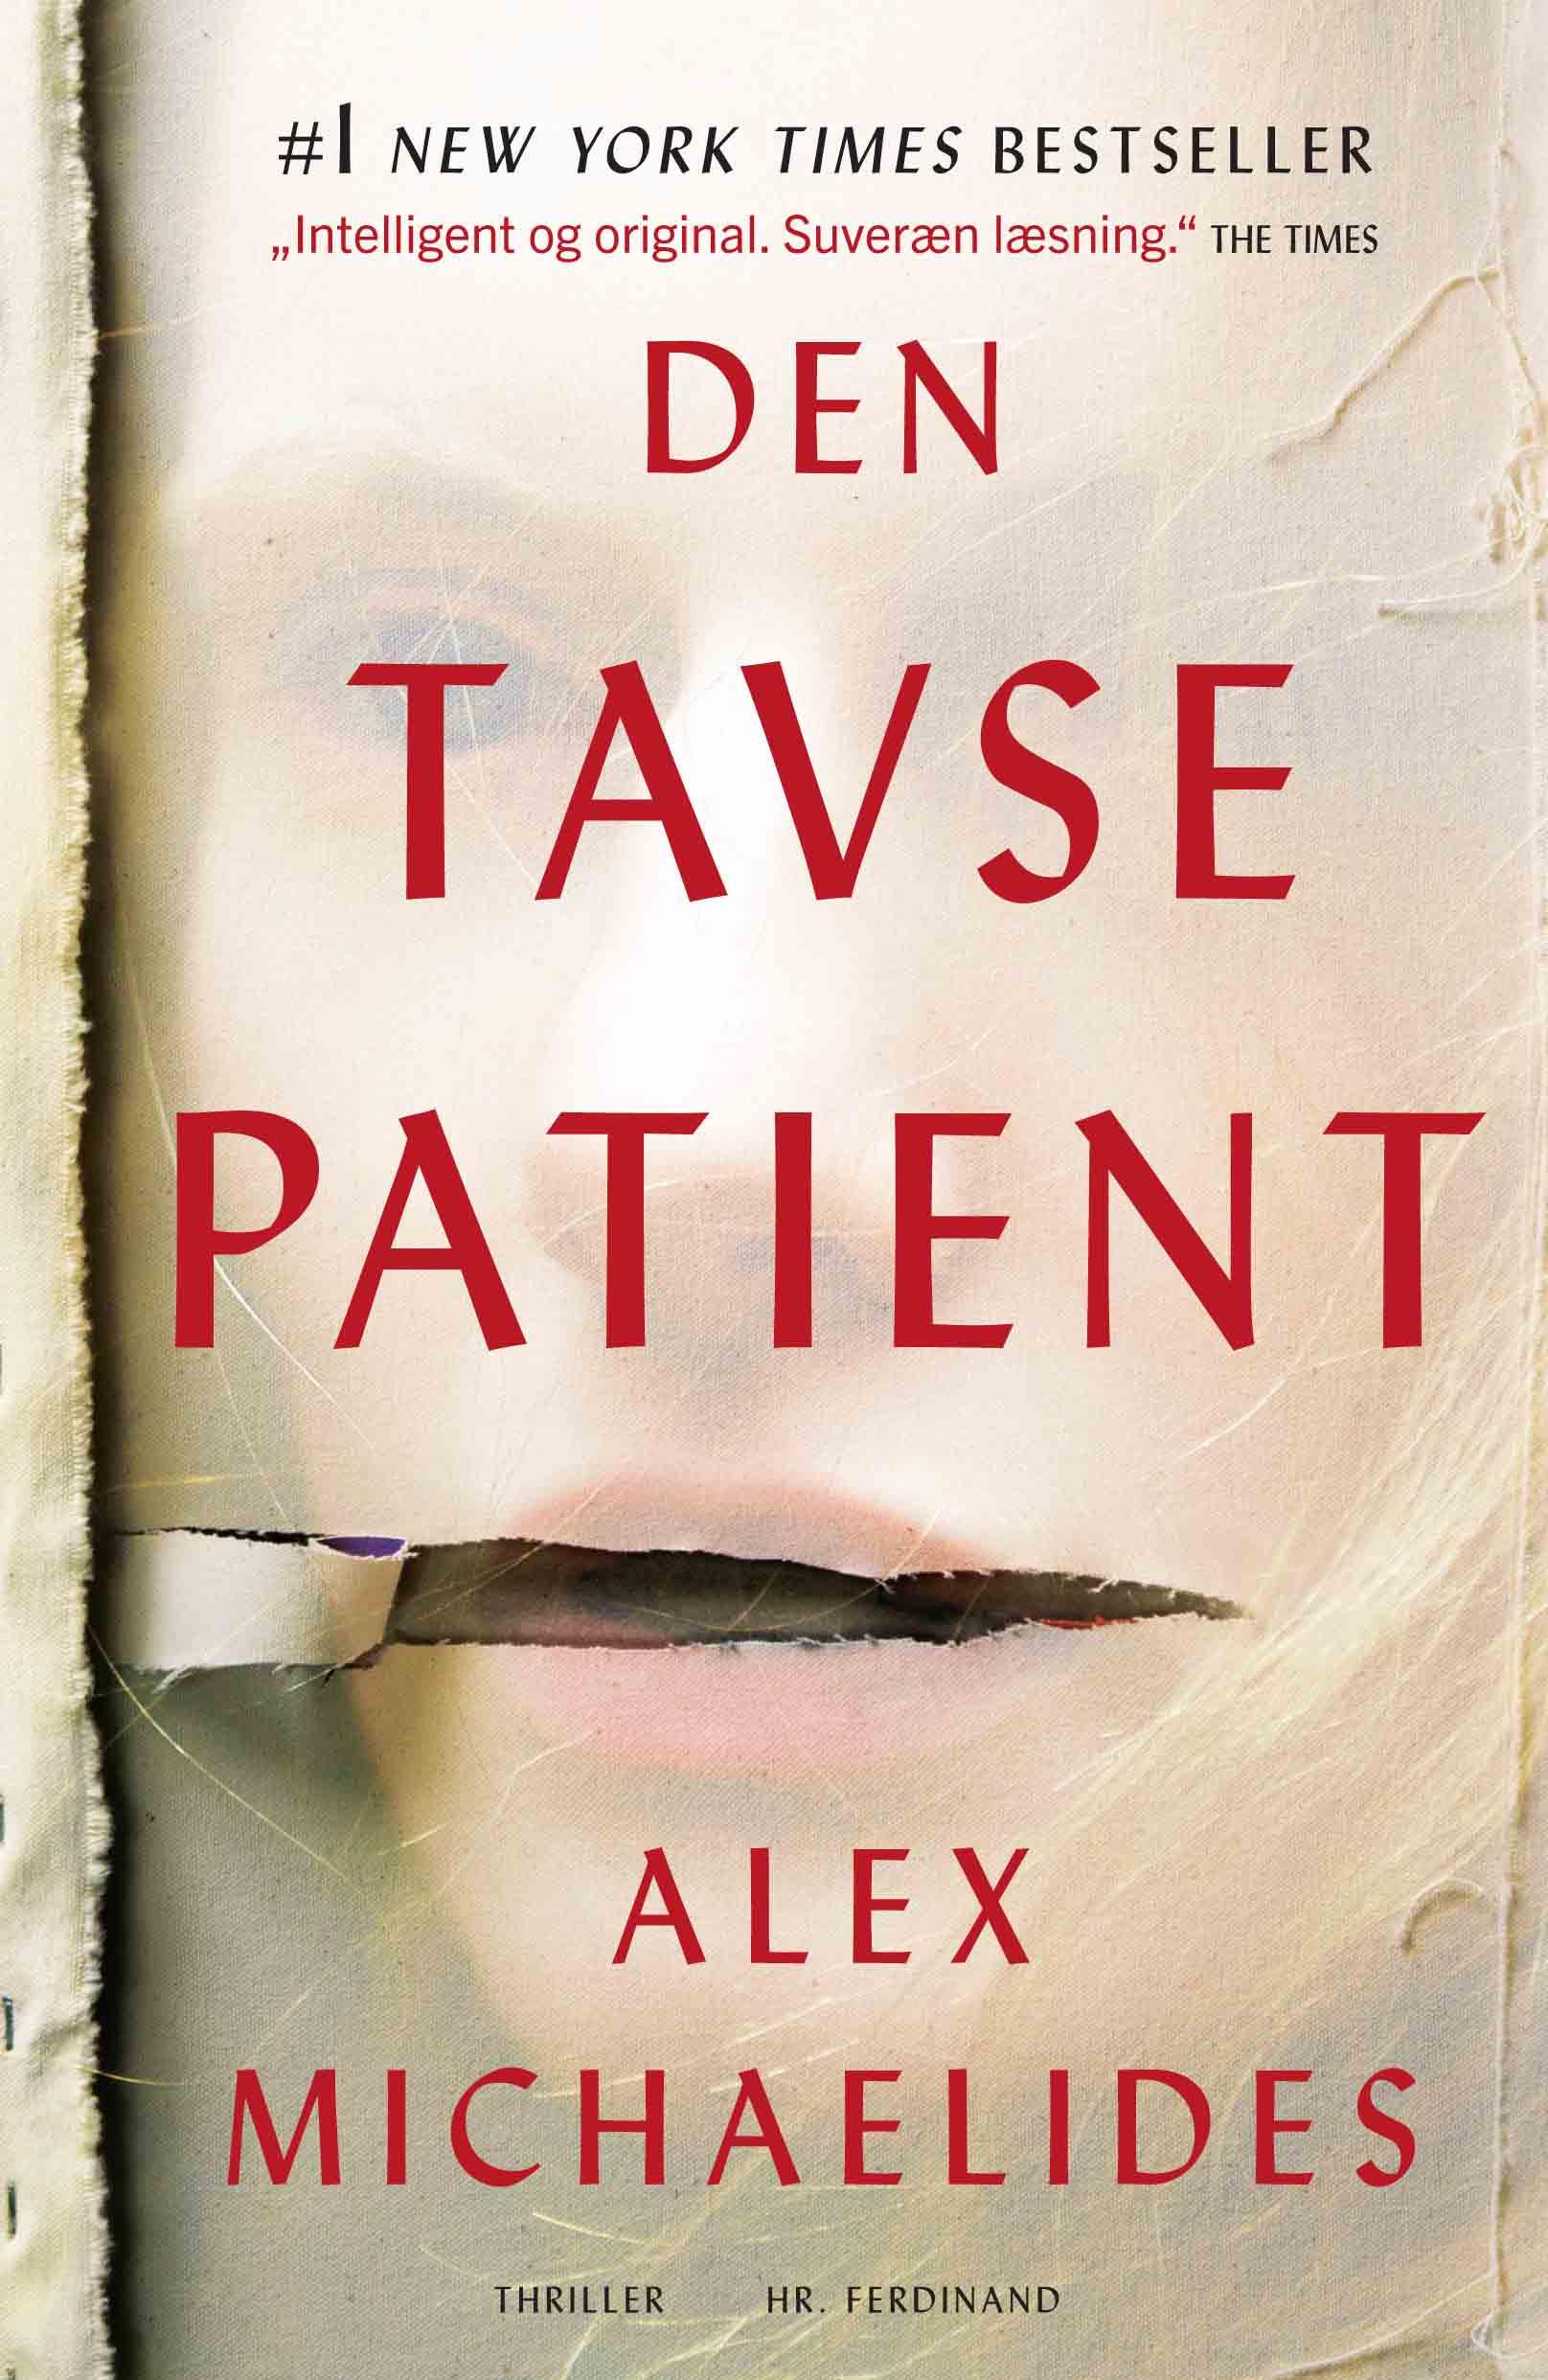 Den tavse patient - Alex Michaelides - Bøger - Hr. Ferdinand - 9788740055108 - 24/3-2020